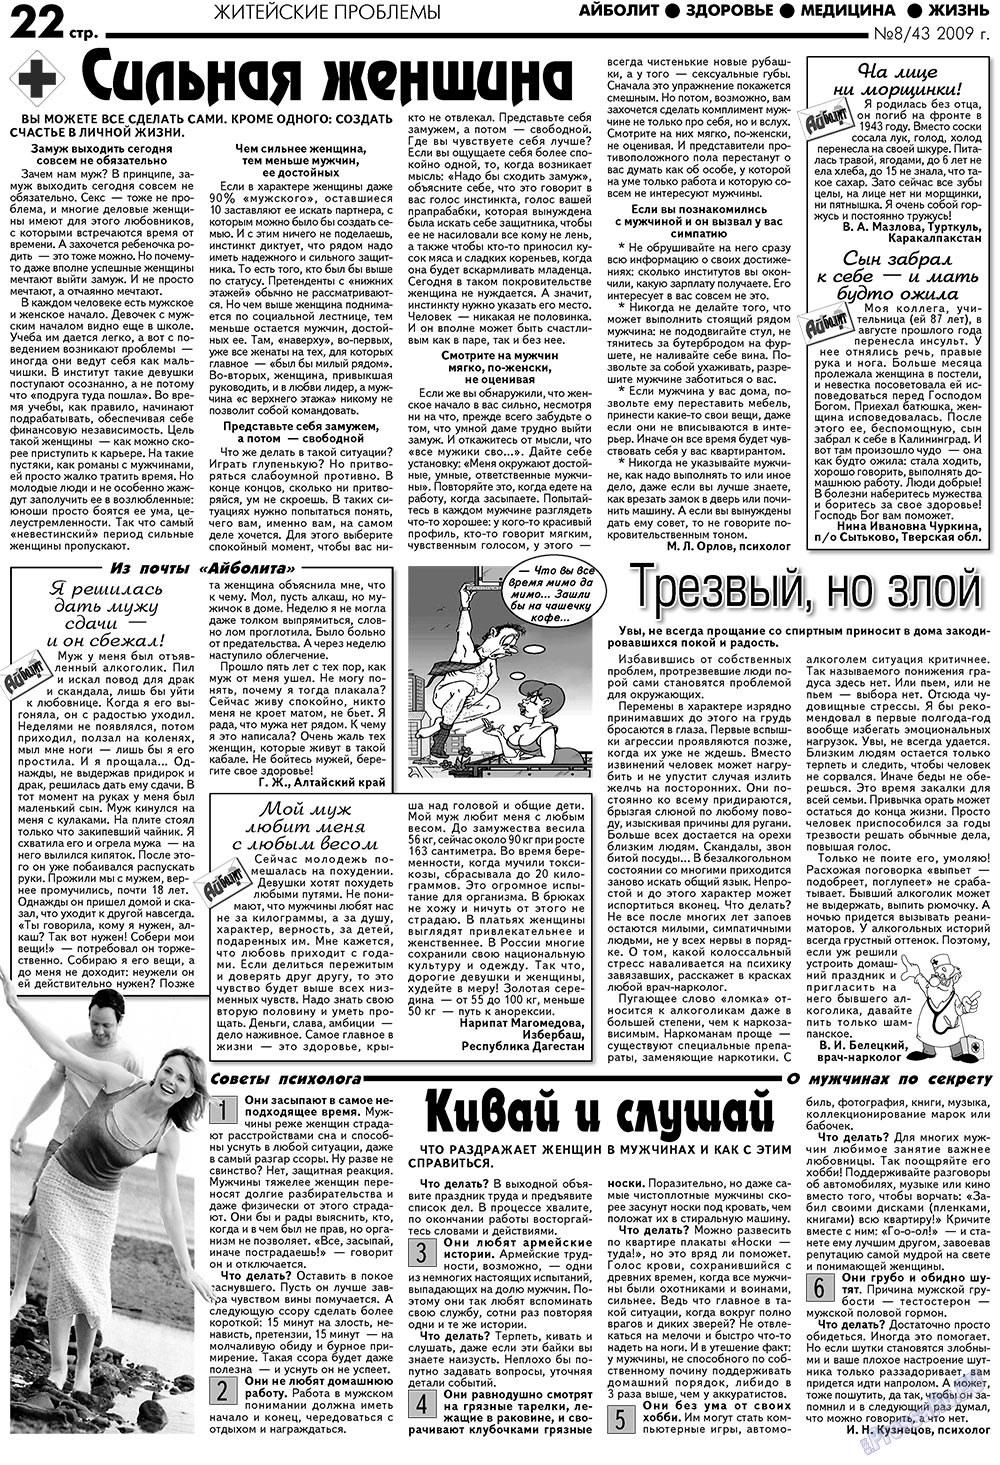 АйБолит (газета). 2009 год, номер 8, стр. 22